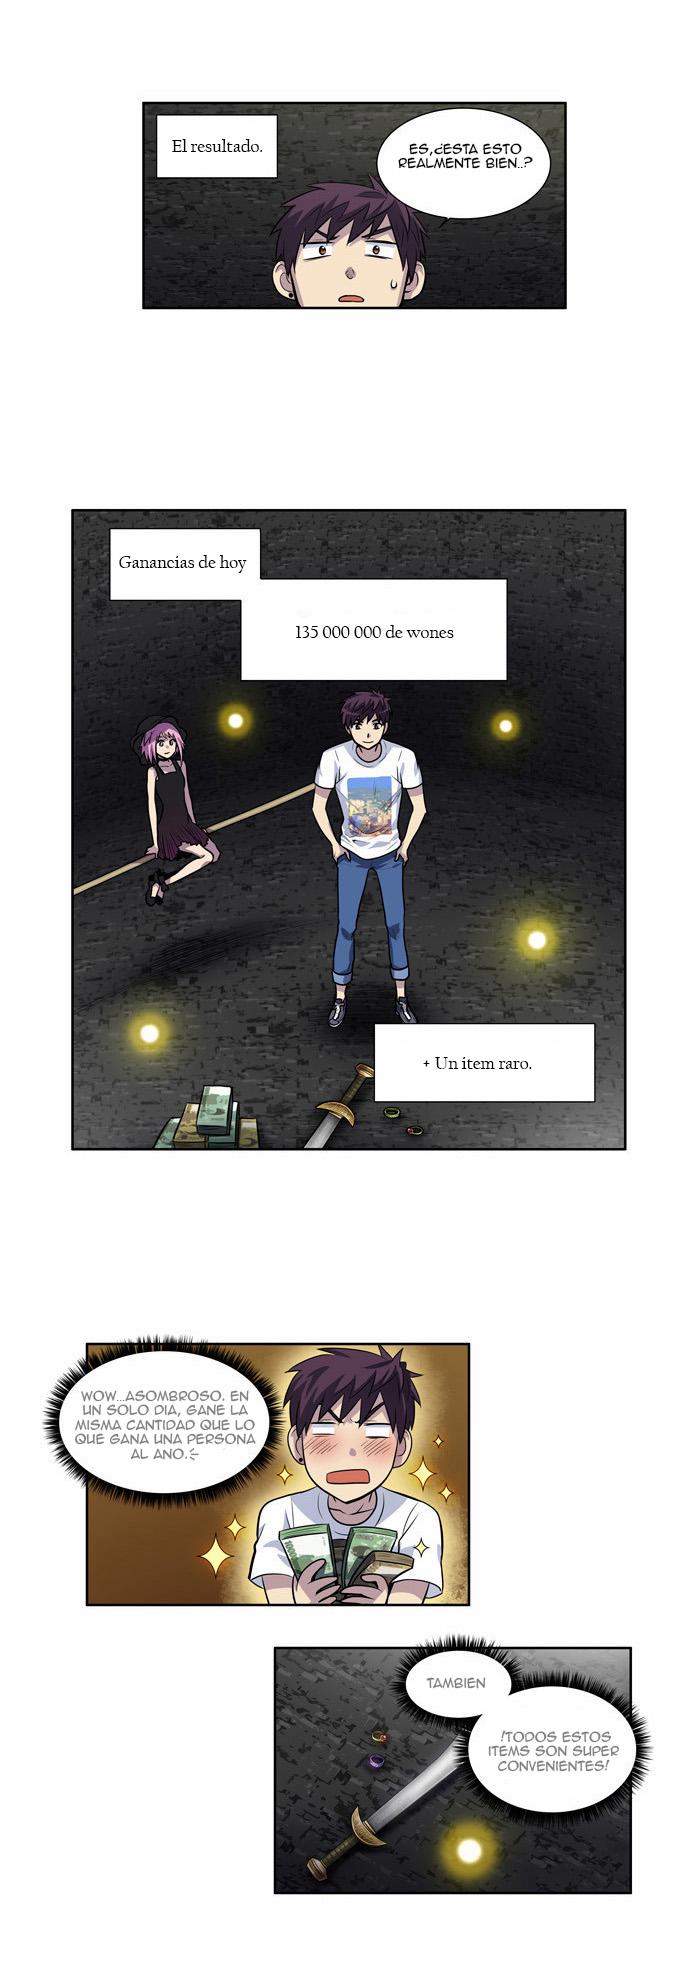 http://c5.ninemanga.com/es_manga/61/1725/416522/2639ba2137371773aa1e64e7735cdb30.jpg Page 9